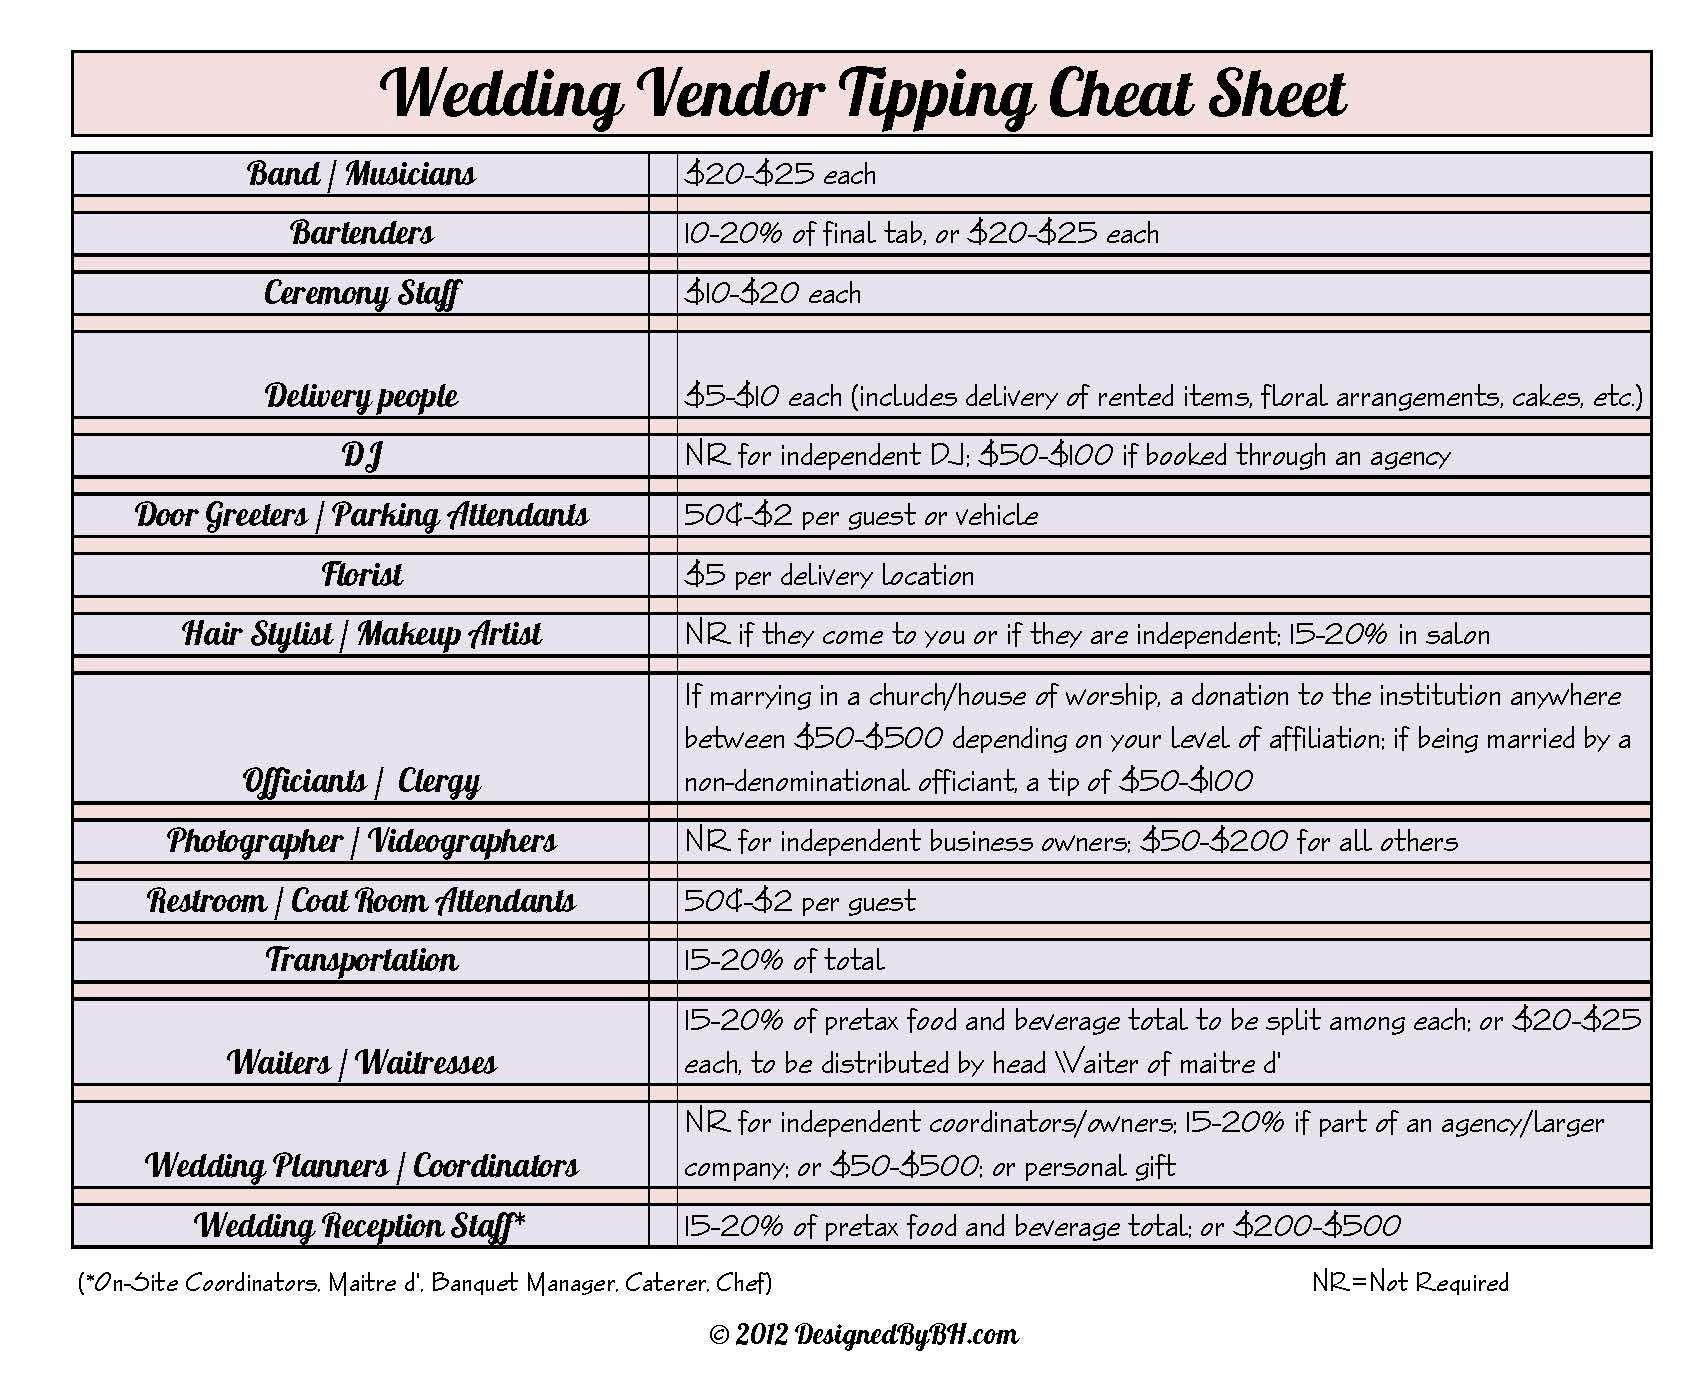 Wedding Vendor Tipping Cheat Sheet